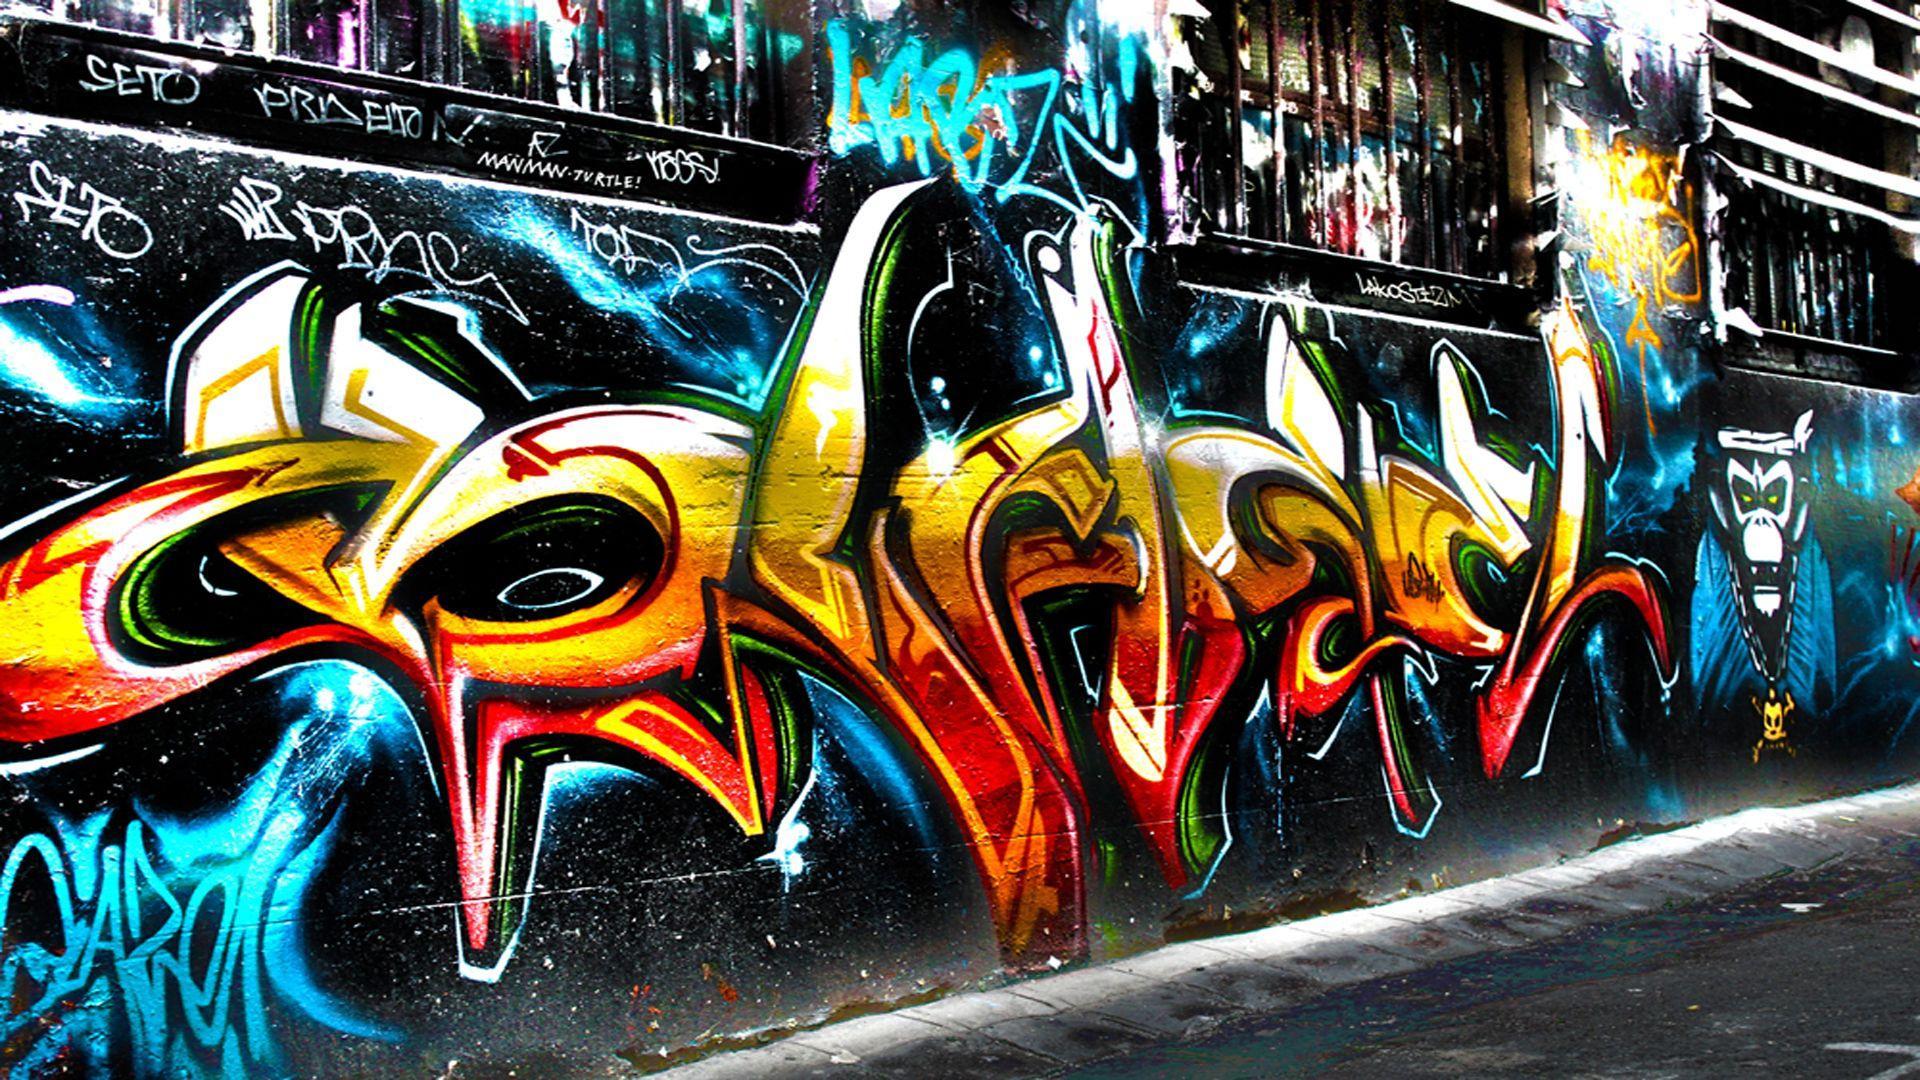 3008x2000 graffiti wallpapers archives hd desktop wallpapers 4k hd